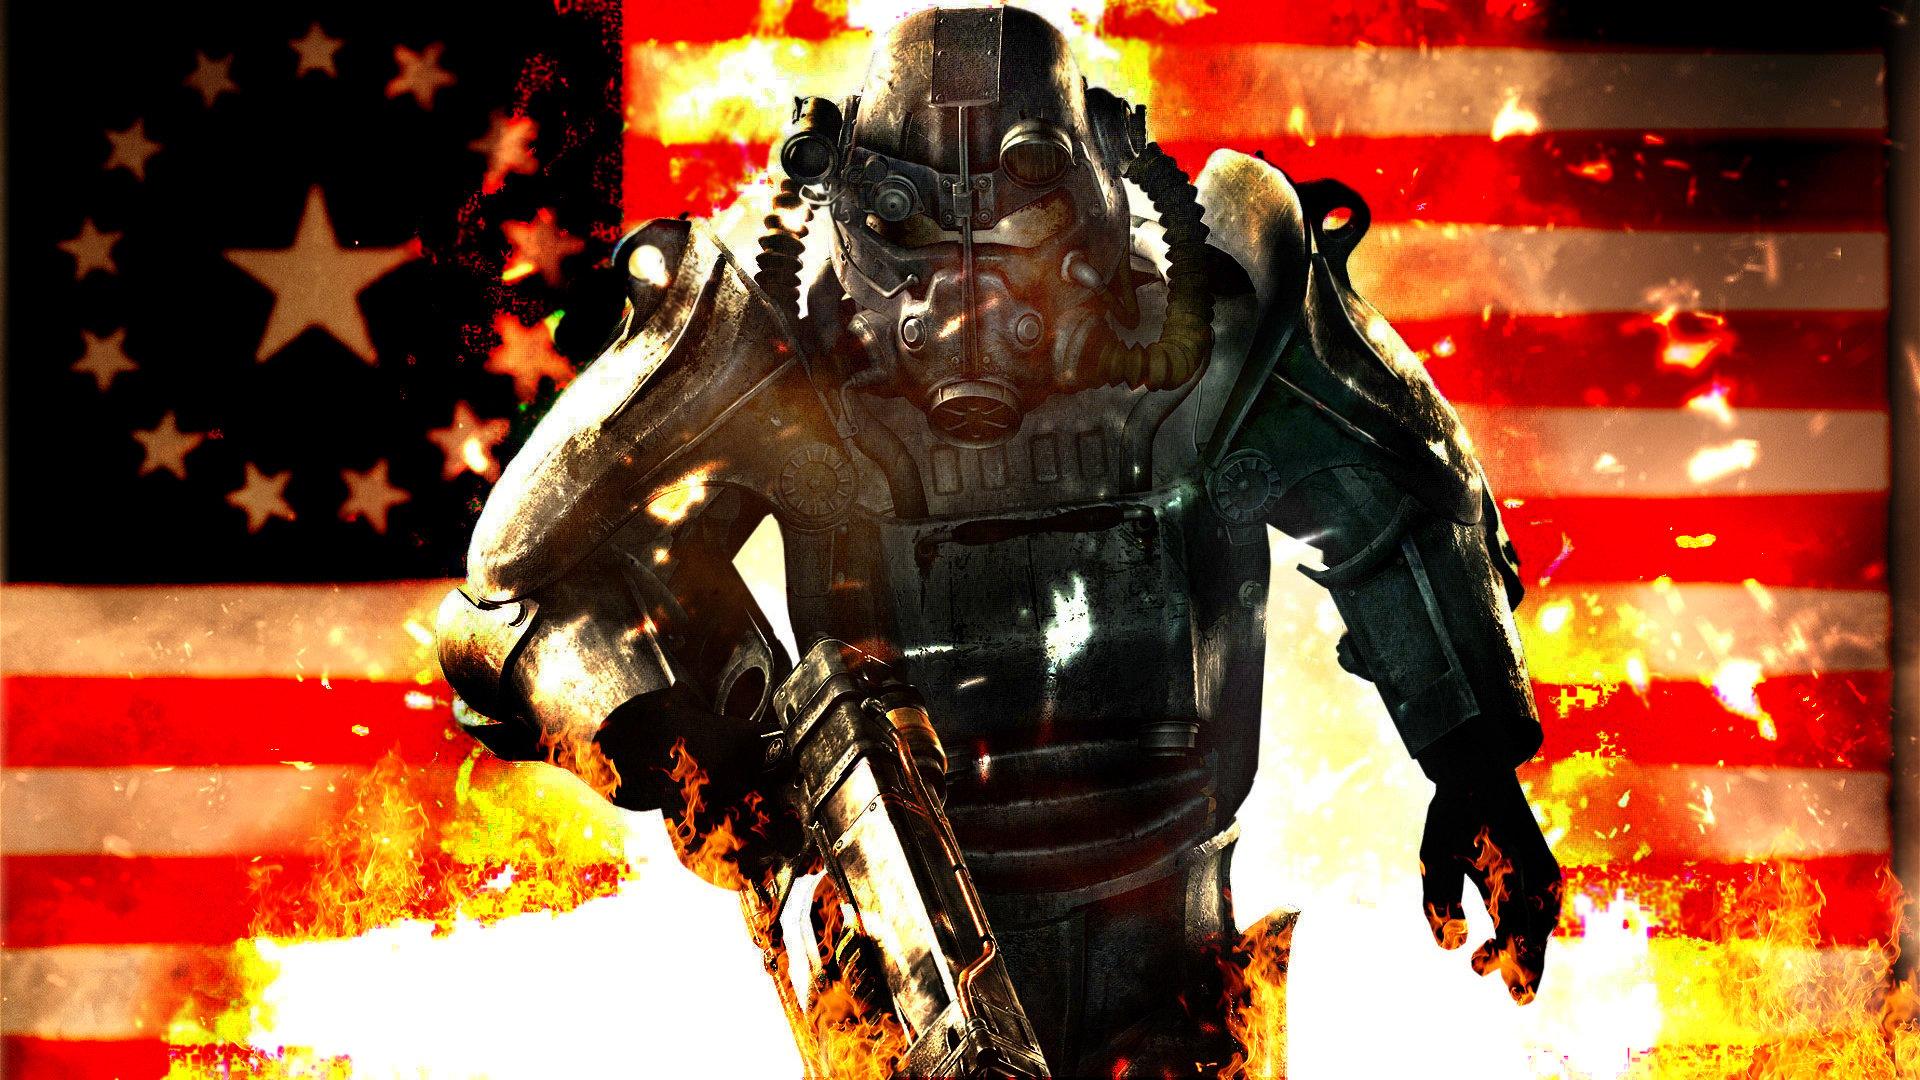 Fallout Brotherhood Of Steel Wallpaper 1920x1080 Brotherhood of steel 1920x1080